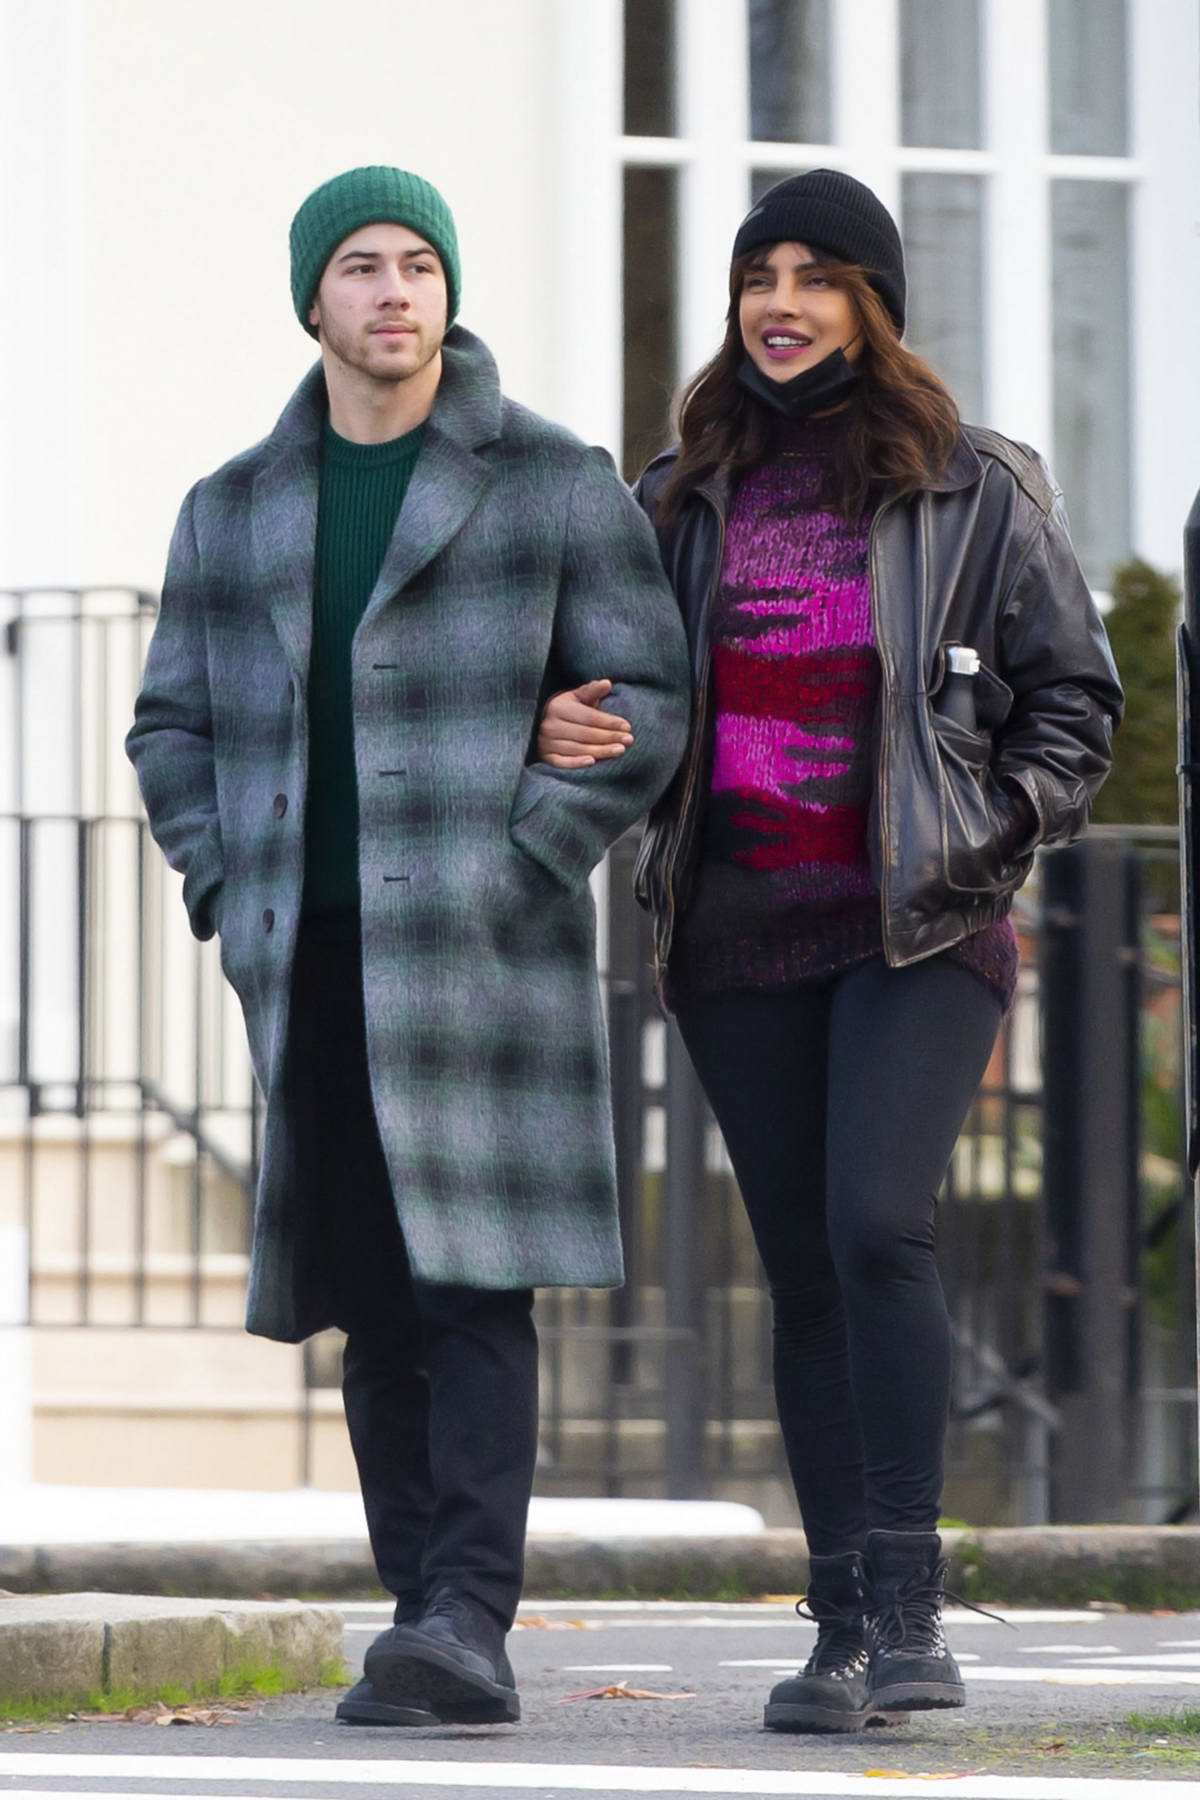 Priyanka Chopra is all smiles while enjoying a stroll with husband Nick Jonas in London, UK